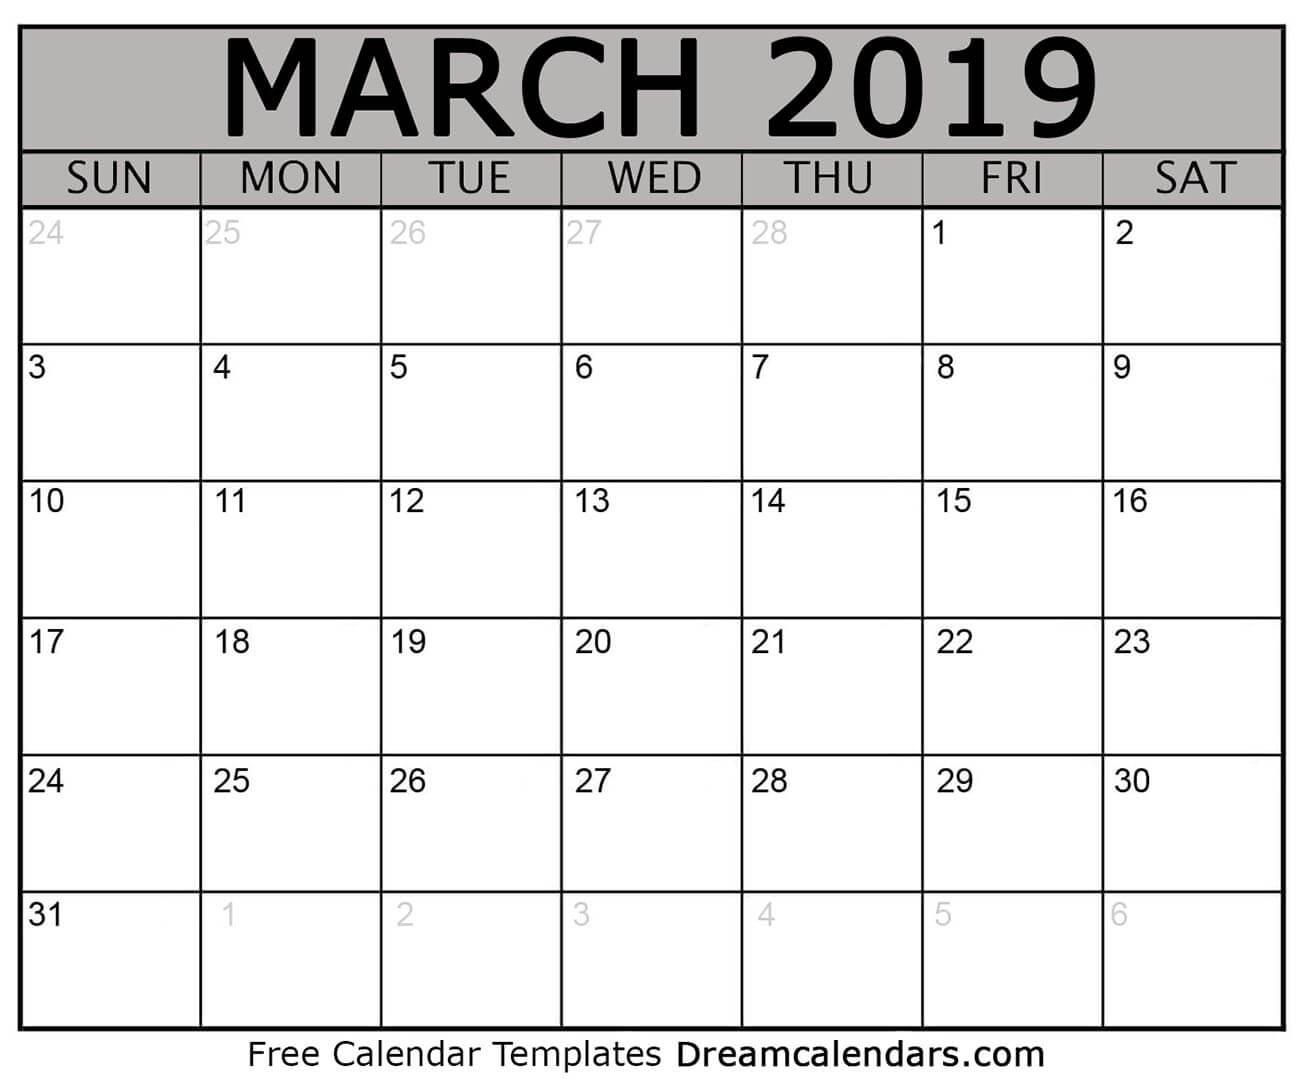 Free March 2019 Printable Calendar   Dream Calendars